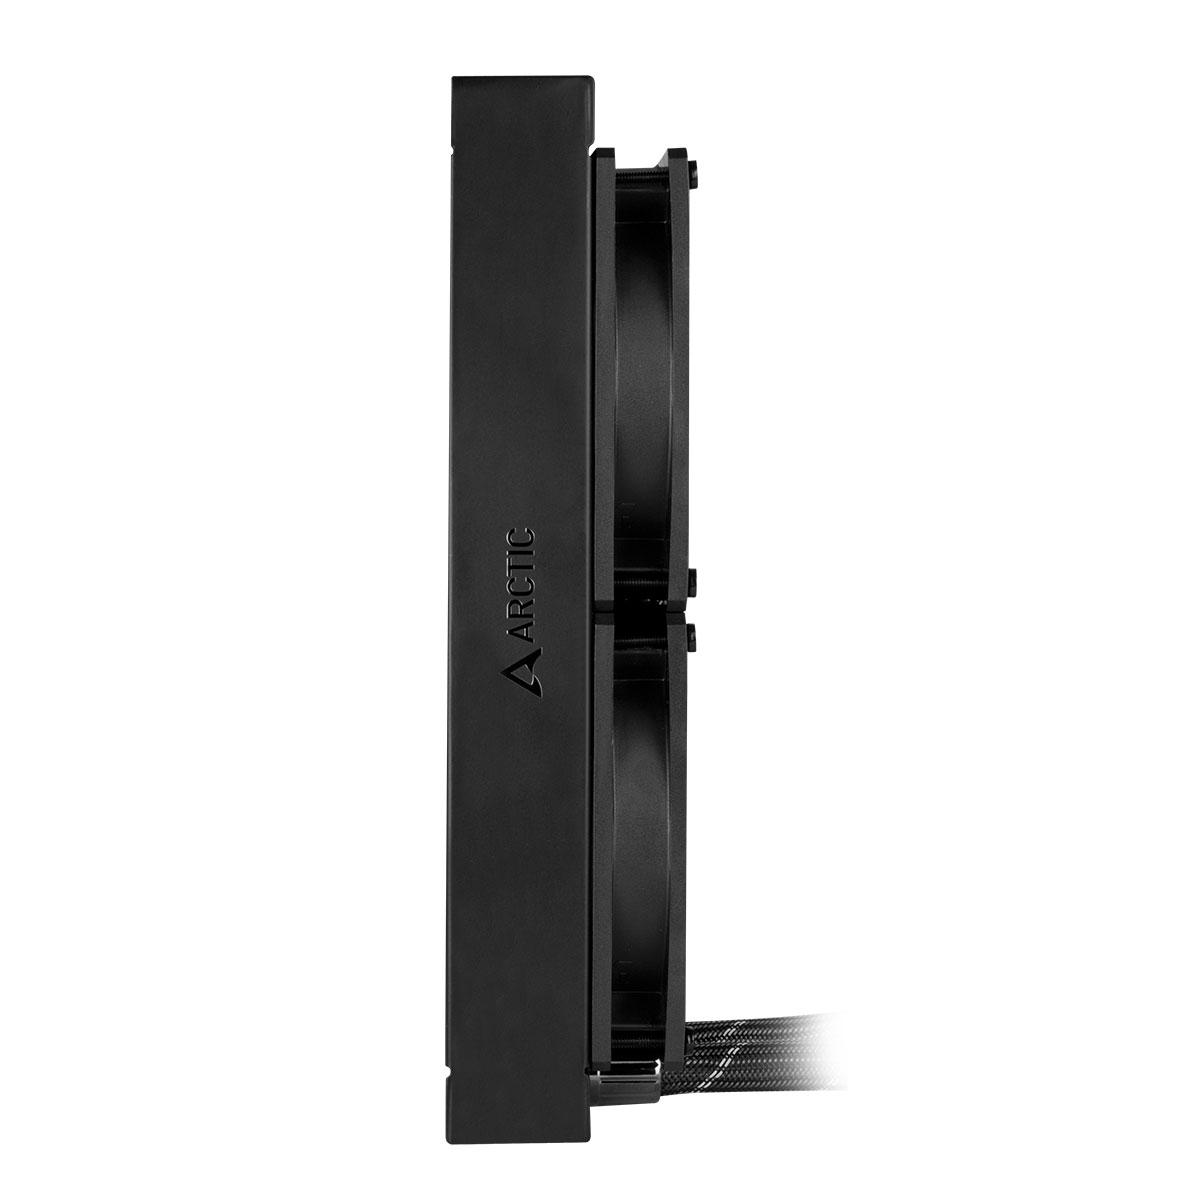 Multi-Compatible AiO CPU Water Cooler ARCTIC Liquid Freezer II 240 Side View